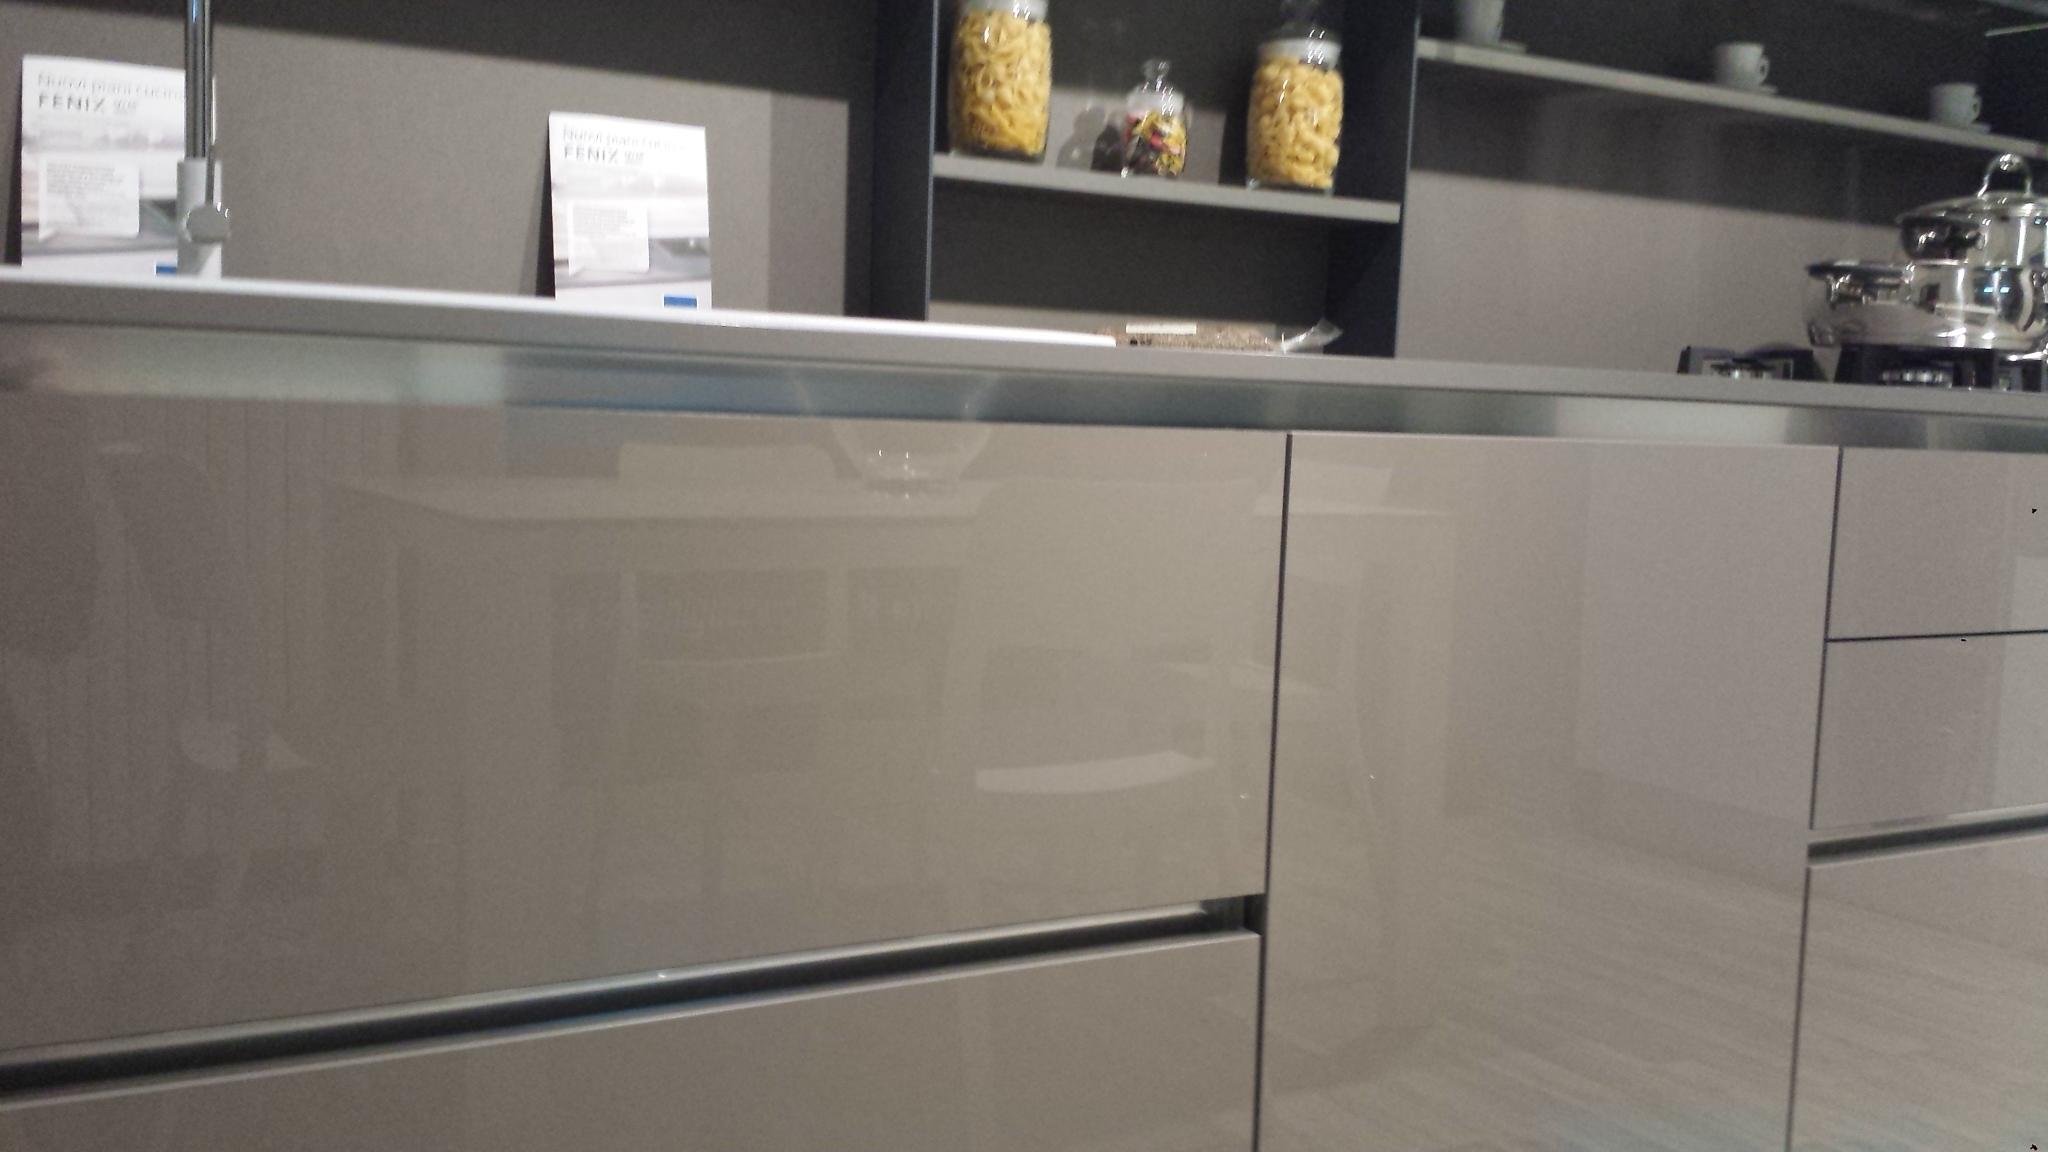 Emejing cucine con gola photos ideas design 2017 - Mobilandia cucine prezzi ...